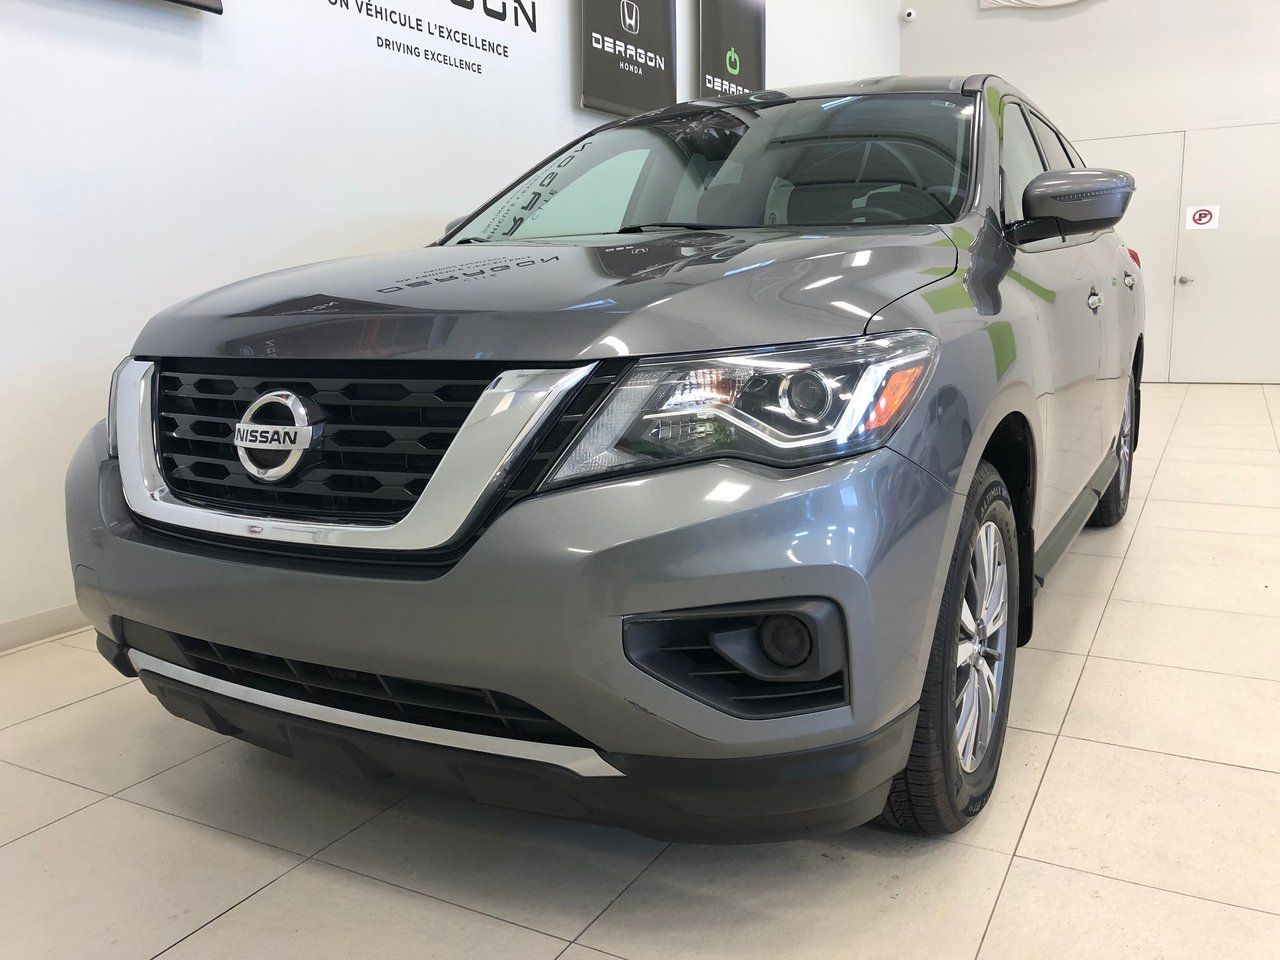 Nissan Pathfinder 2018 AWD, V6, 7 PASSAGERS, CAMÉRA